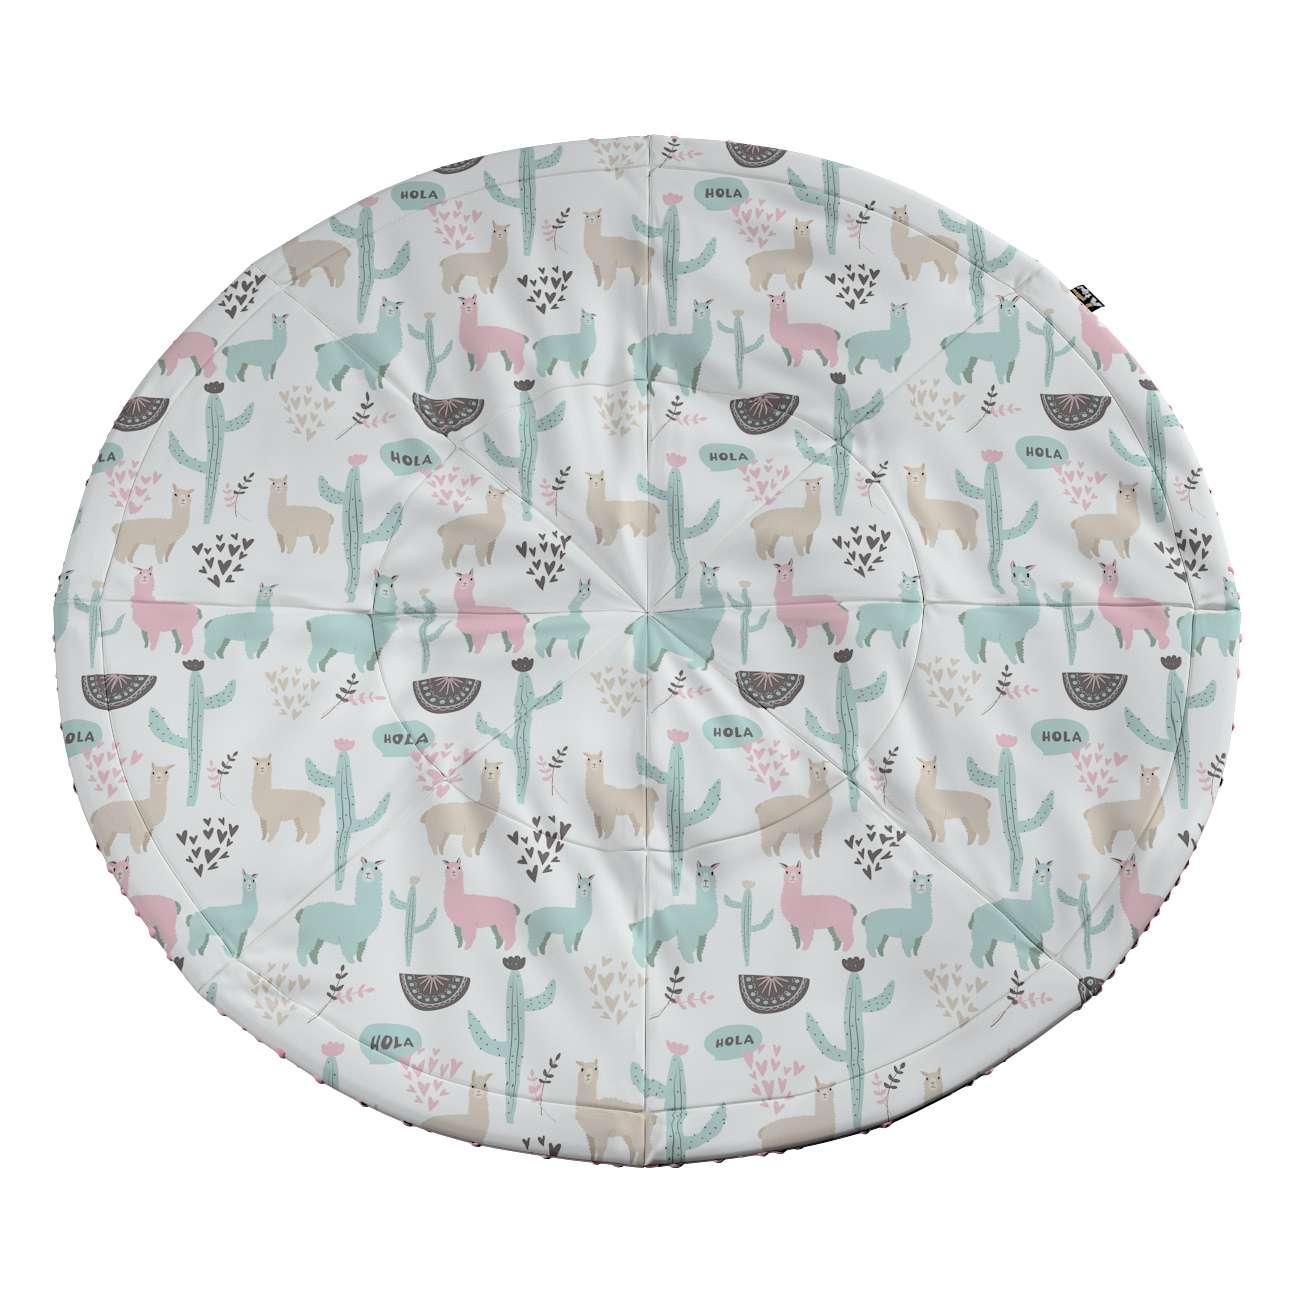 Apvalus kilimėlis kolekcijoje Magic Collection, audinys: 500-01